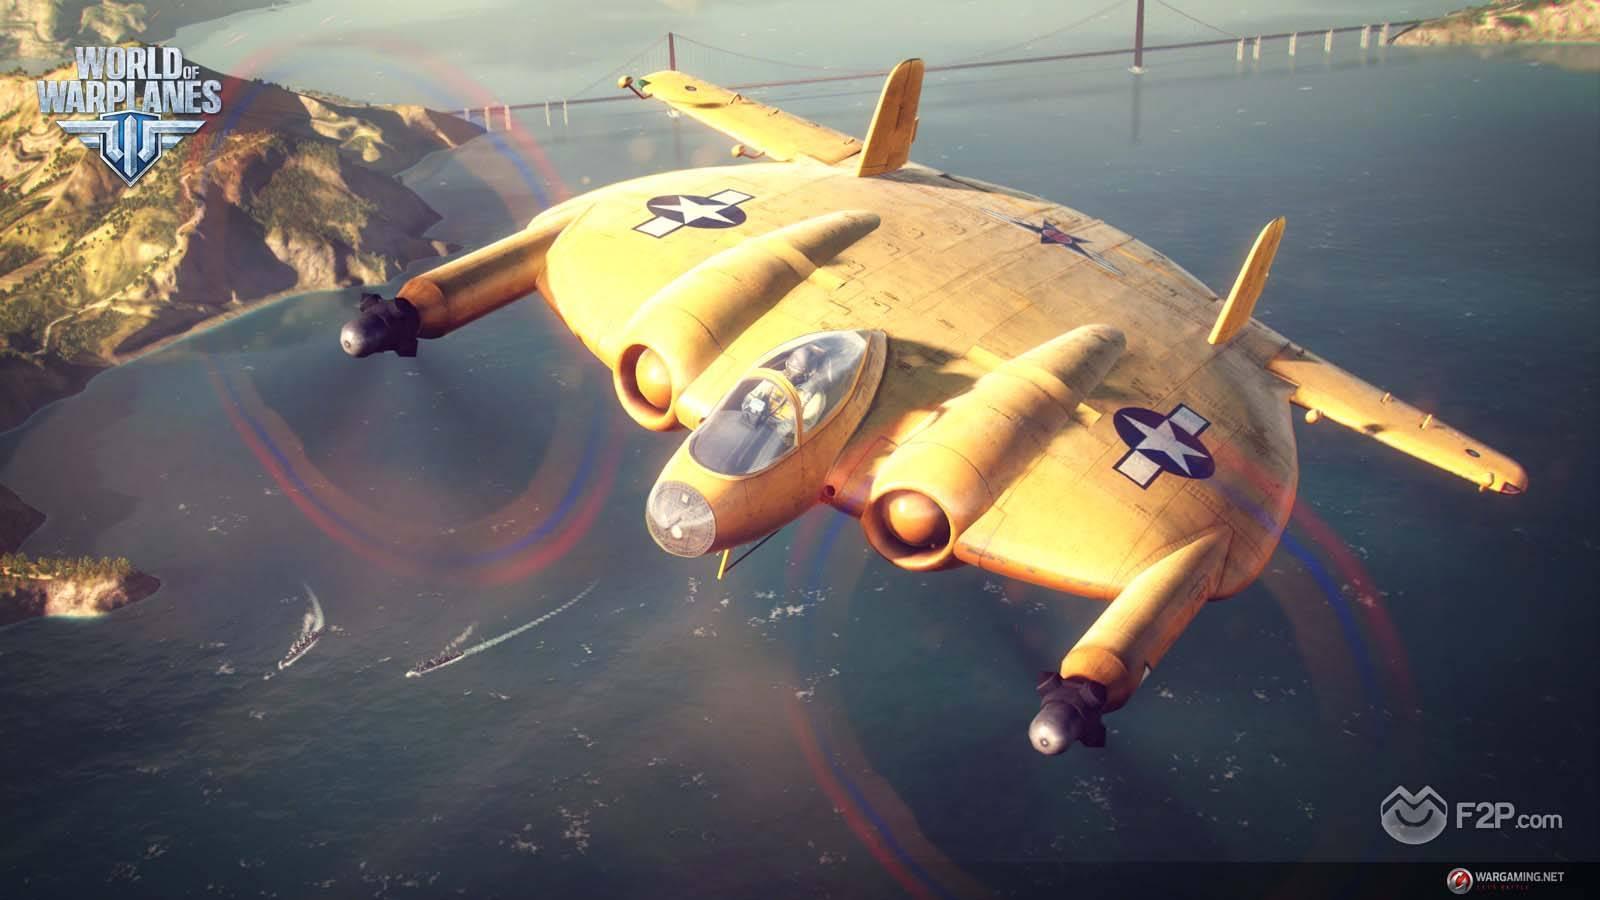 American Heavy Fighters Arrive On World Of Warplanes